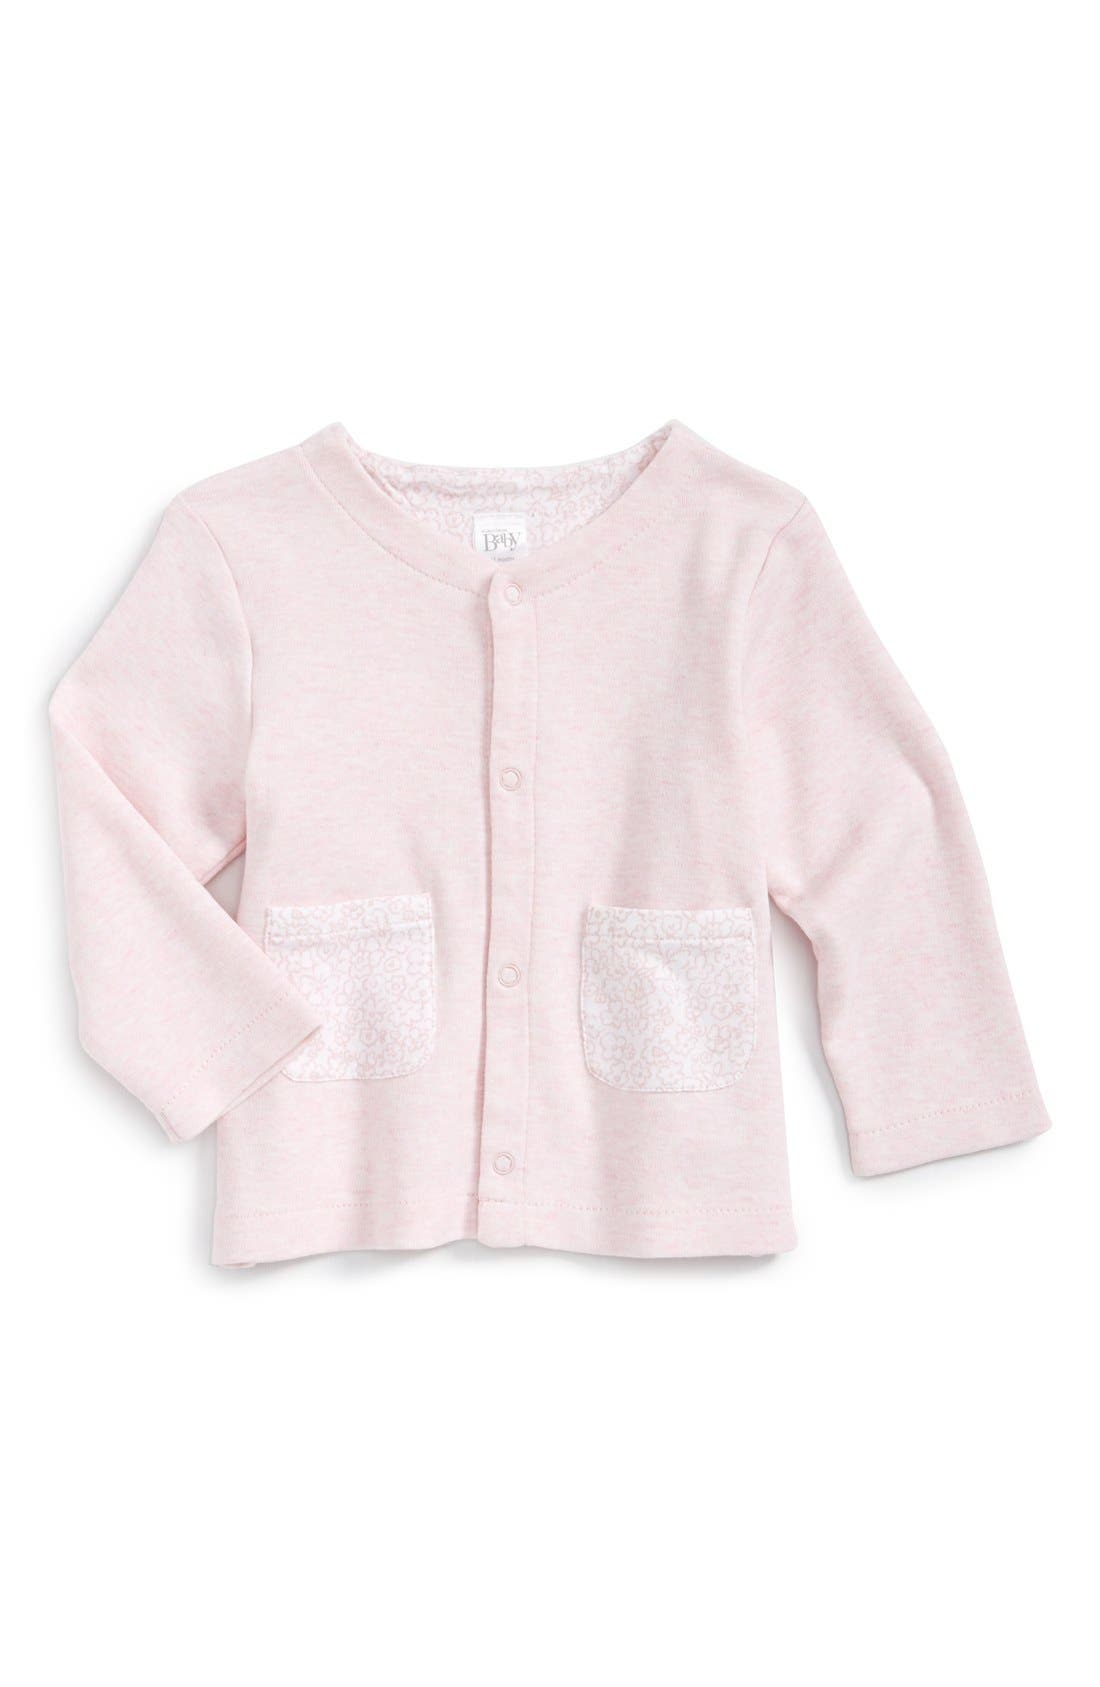 NORDSTROM BABY Contrast Pocket Cotton Cardigan